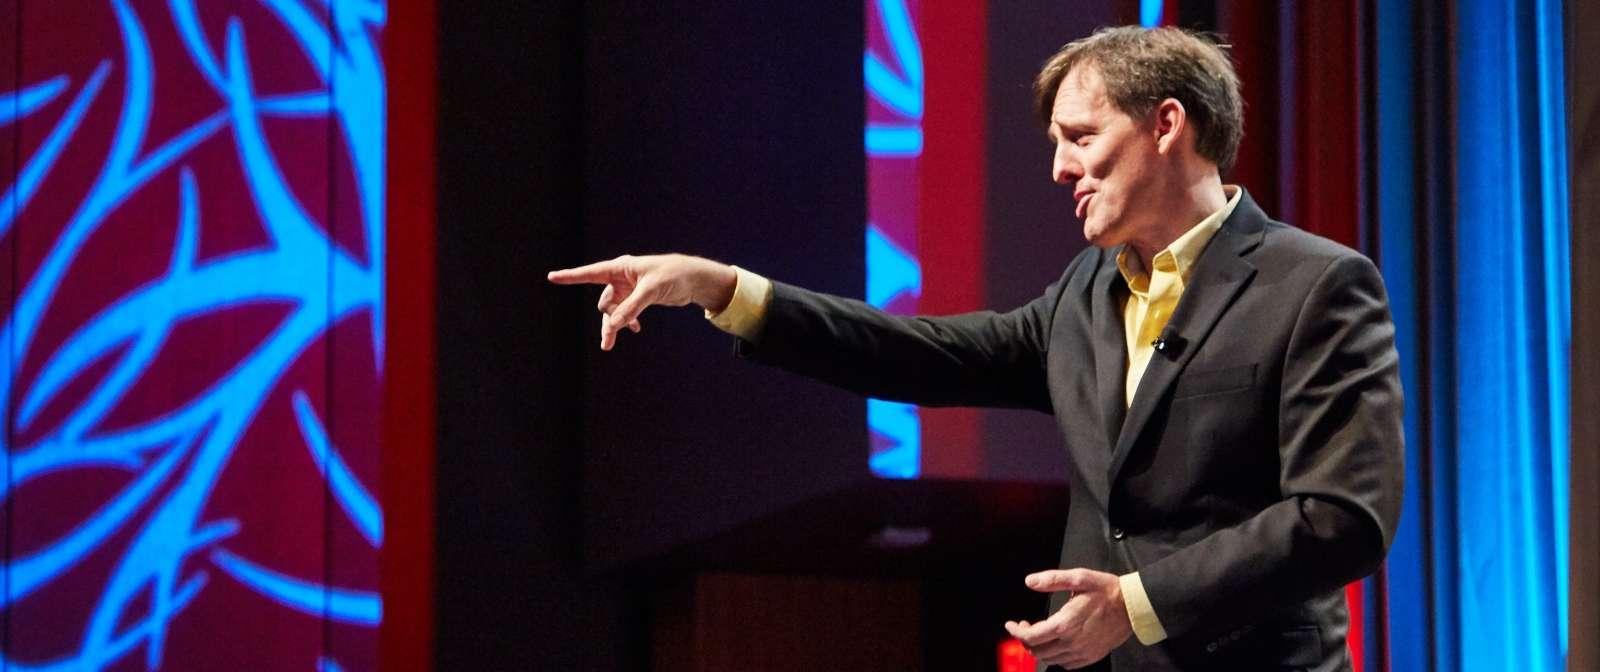 Shawn Clark interactive Teamwork Compass(R) presenter